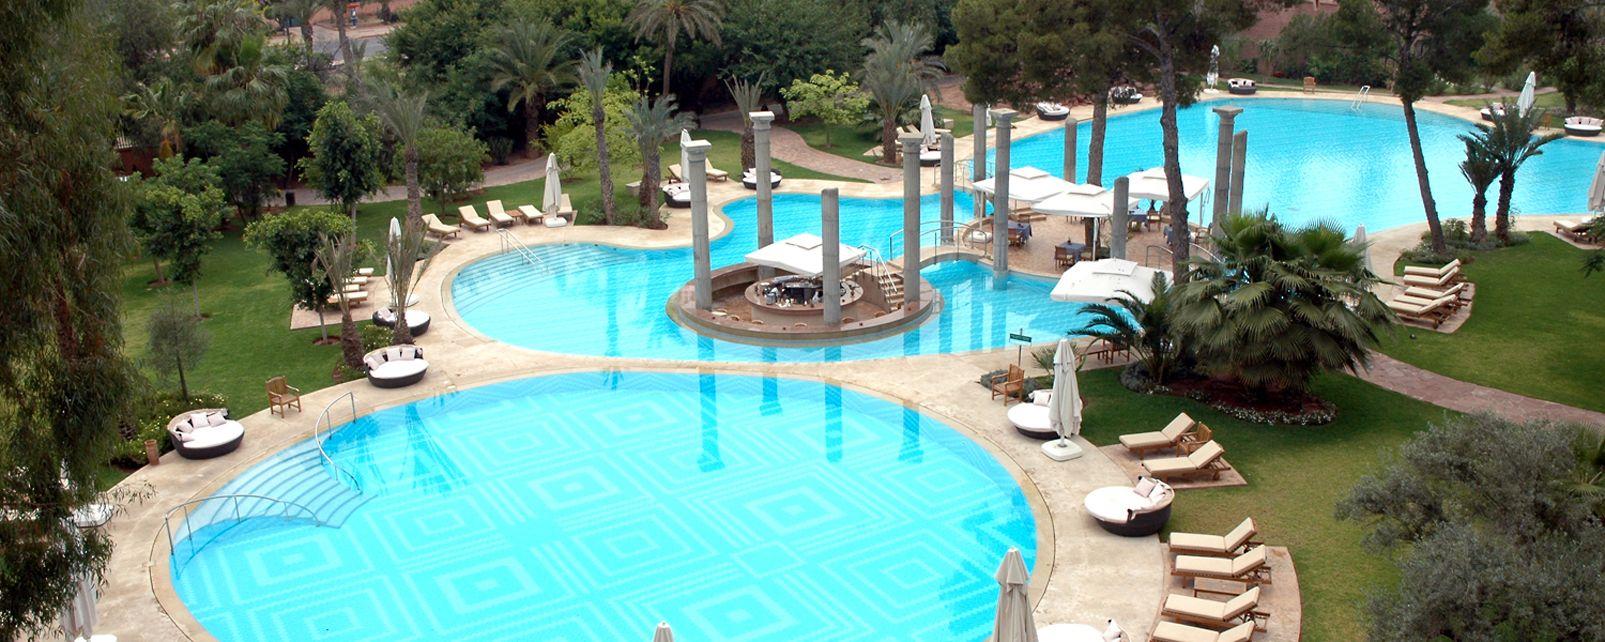 Hôtel Es Saadi Gardens Resort Les Villas